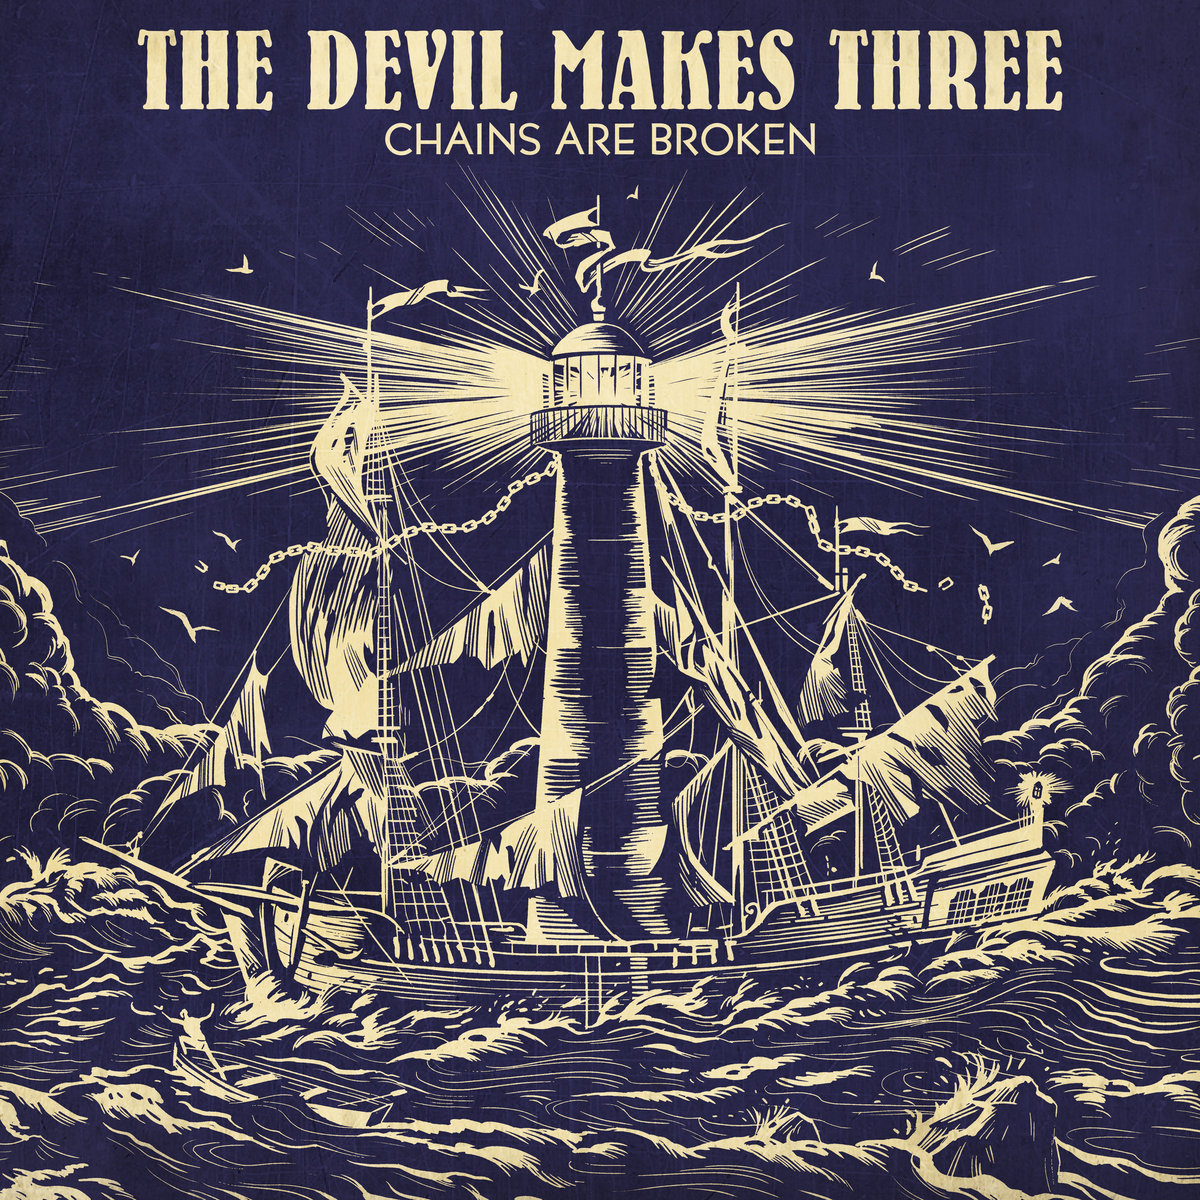 The Devil Makes Three - Chains Are Broken (cover art)